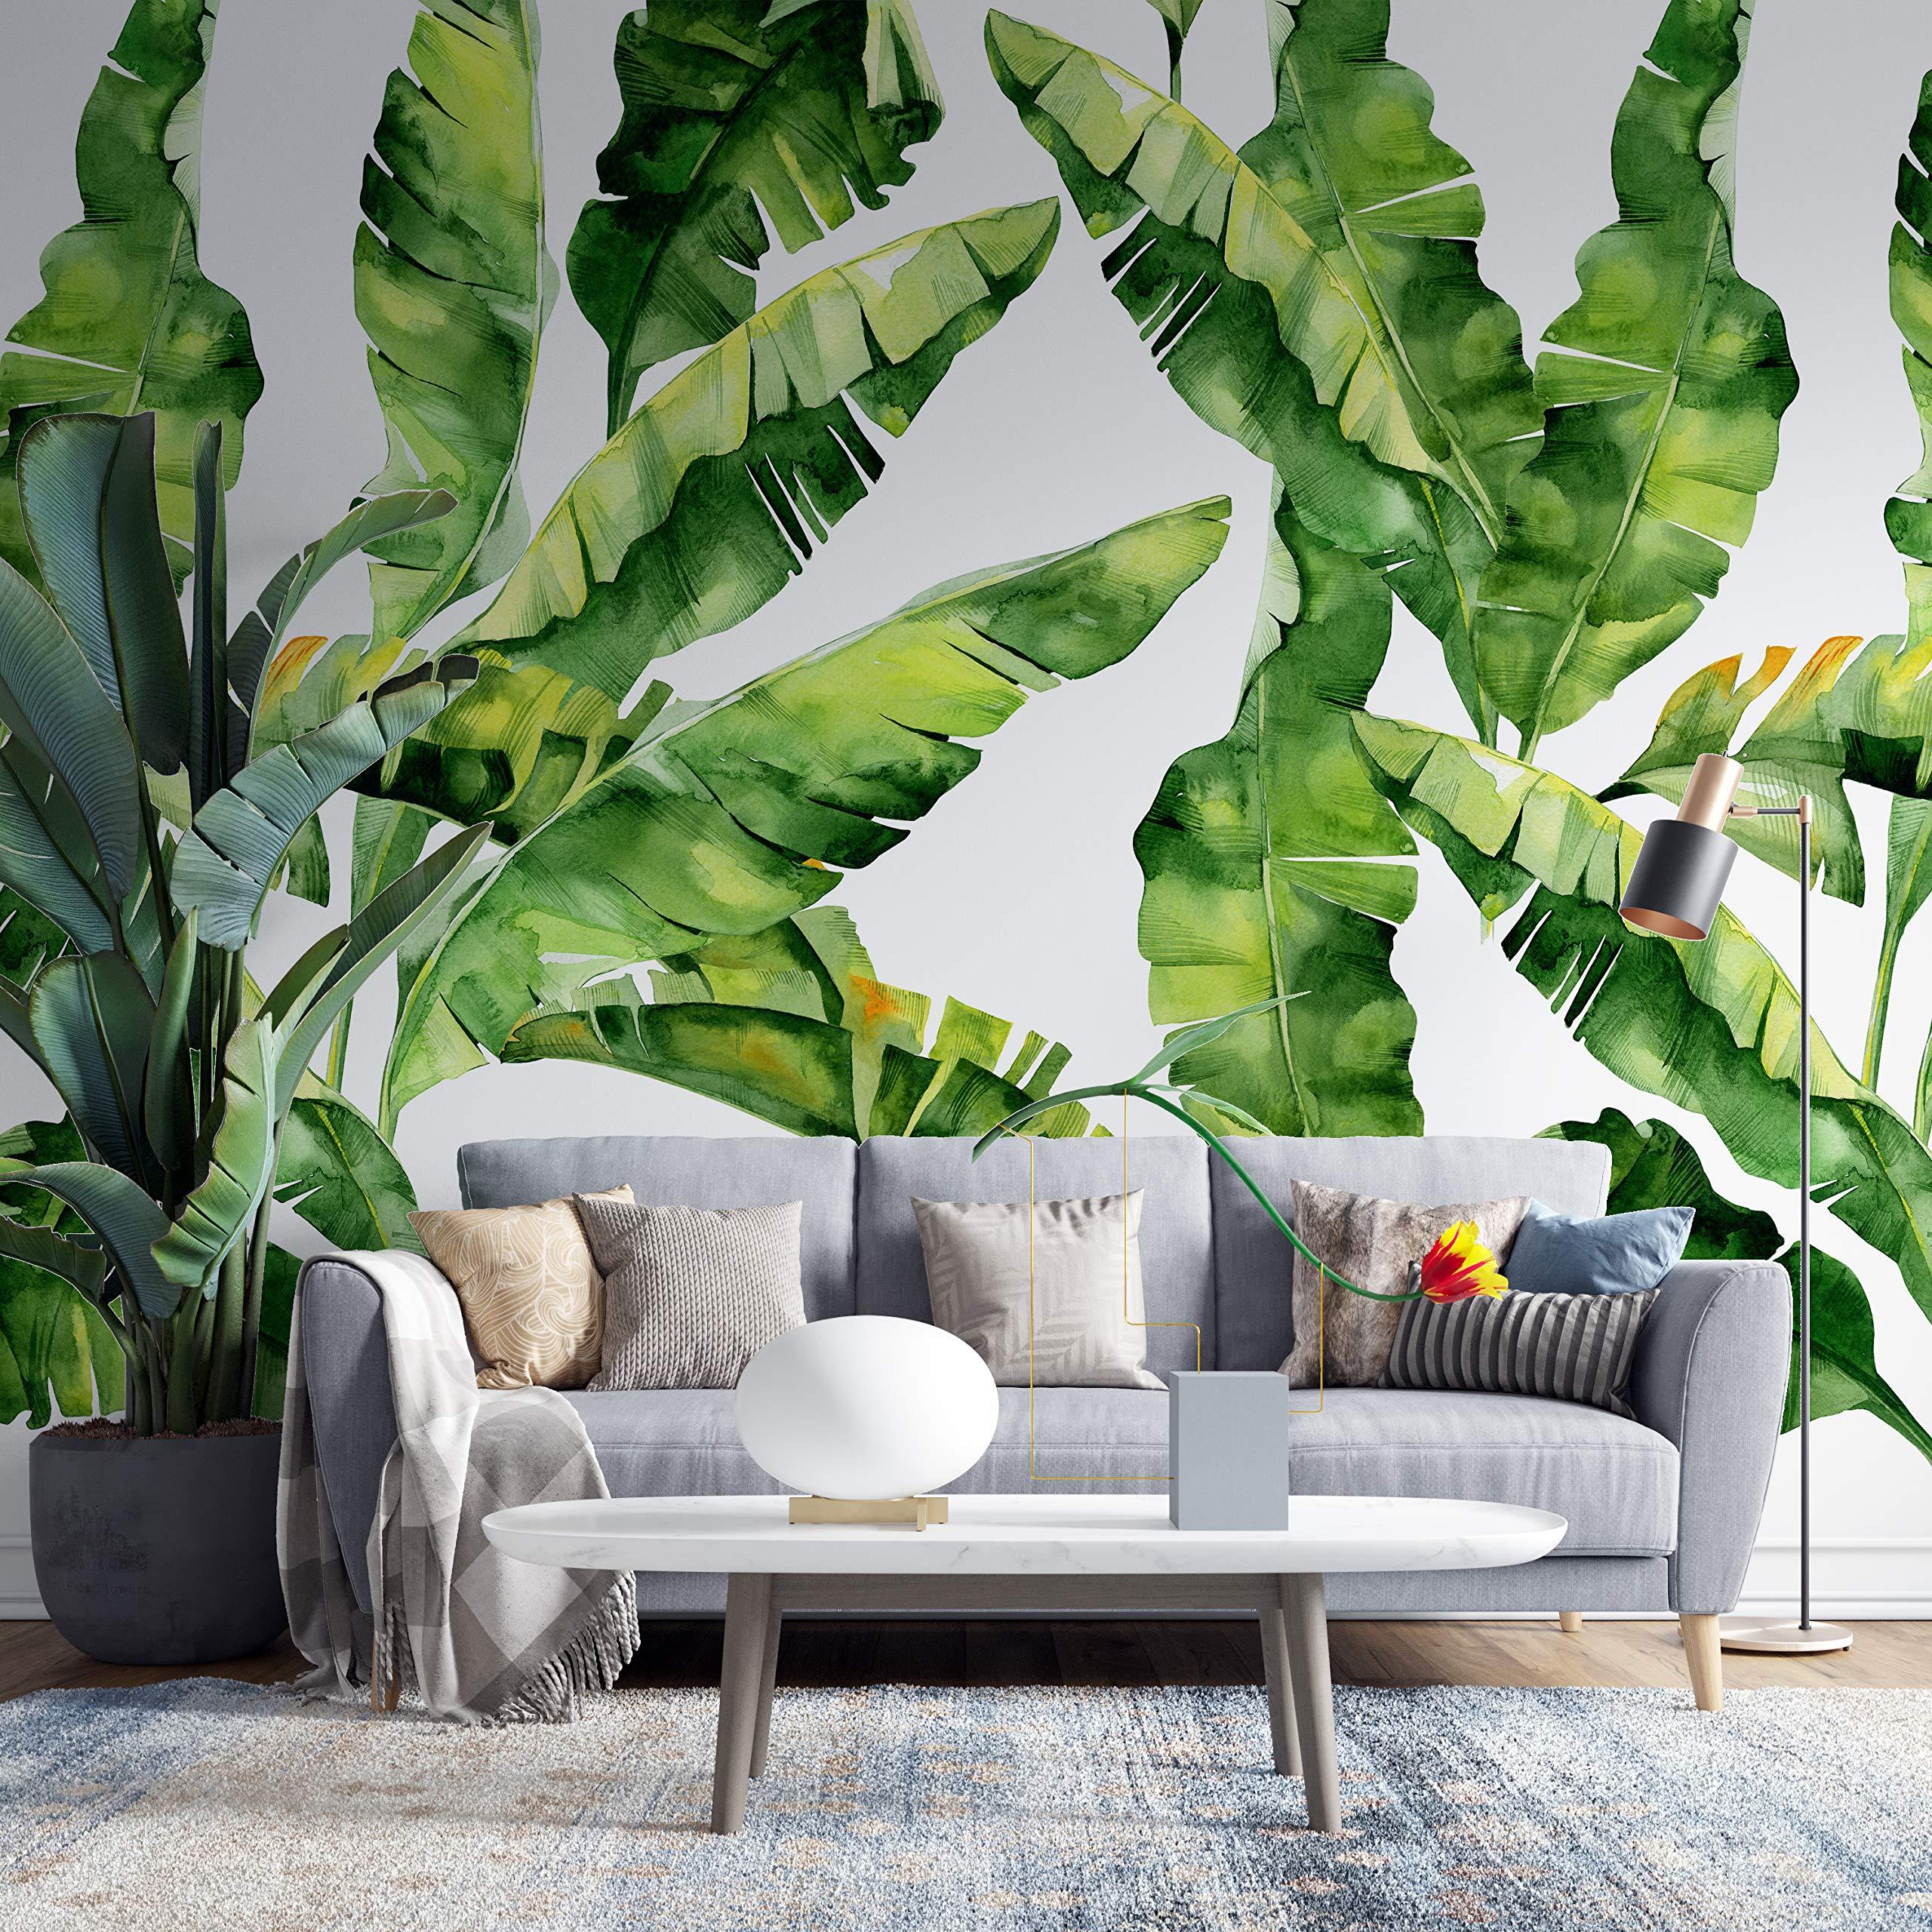 Amazon Co Jp Fleefilo はがせる壁紙 壁紙シール 厚手 植物バナナの葉 柄 壁 シール リメイクシート Diy Fl0845 Fl0845 45cm X 10m ホーム キッチン